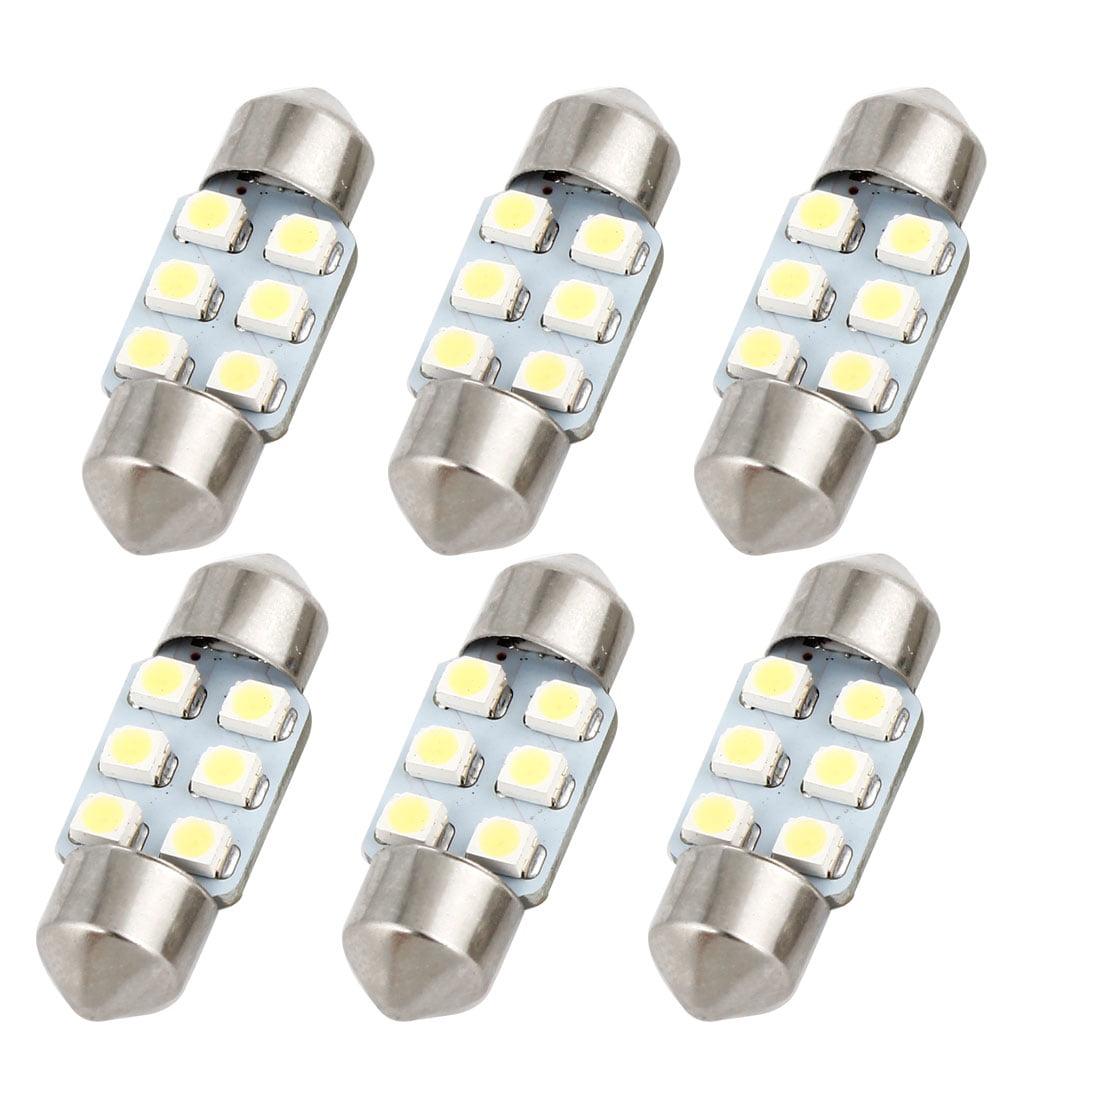 6 Pcs White Dome Light Lamp Bulb DE3175 Internal